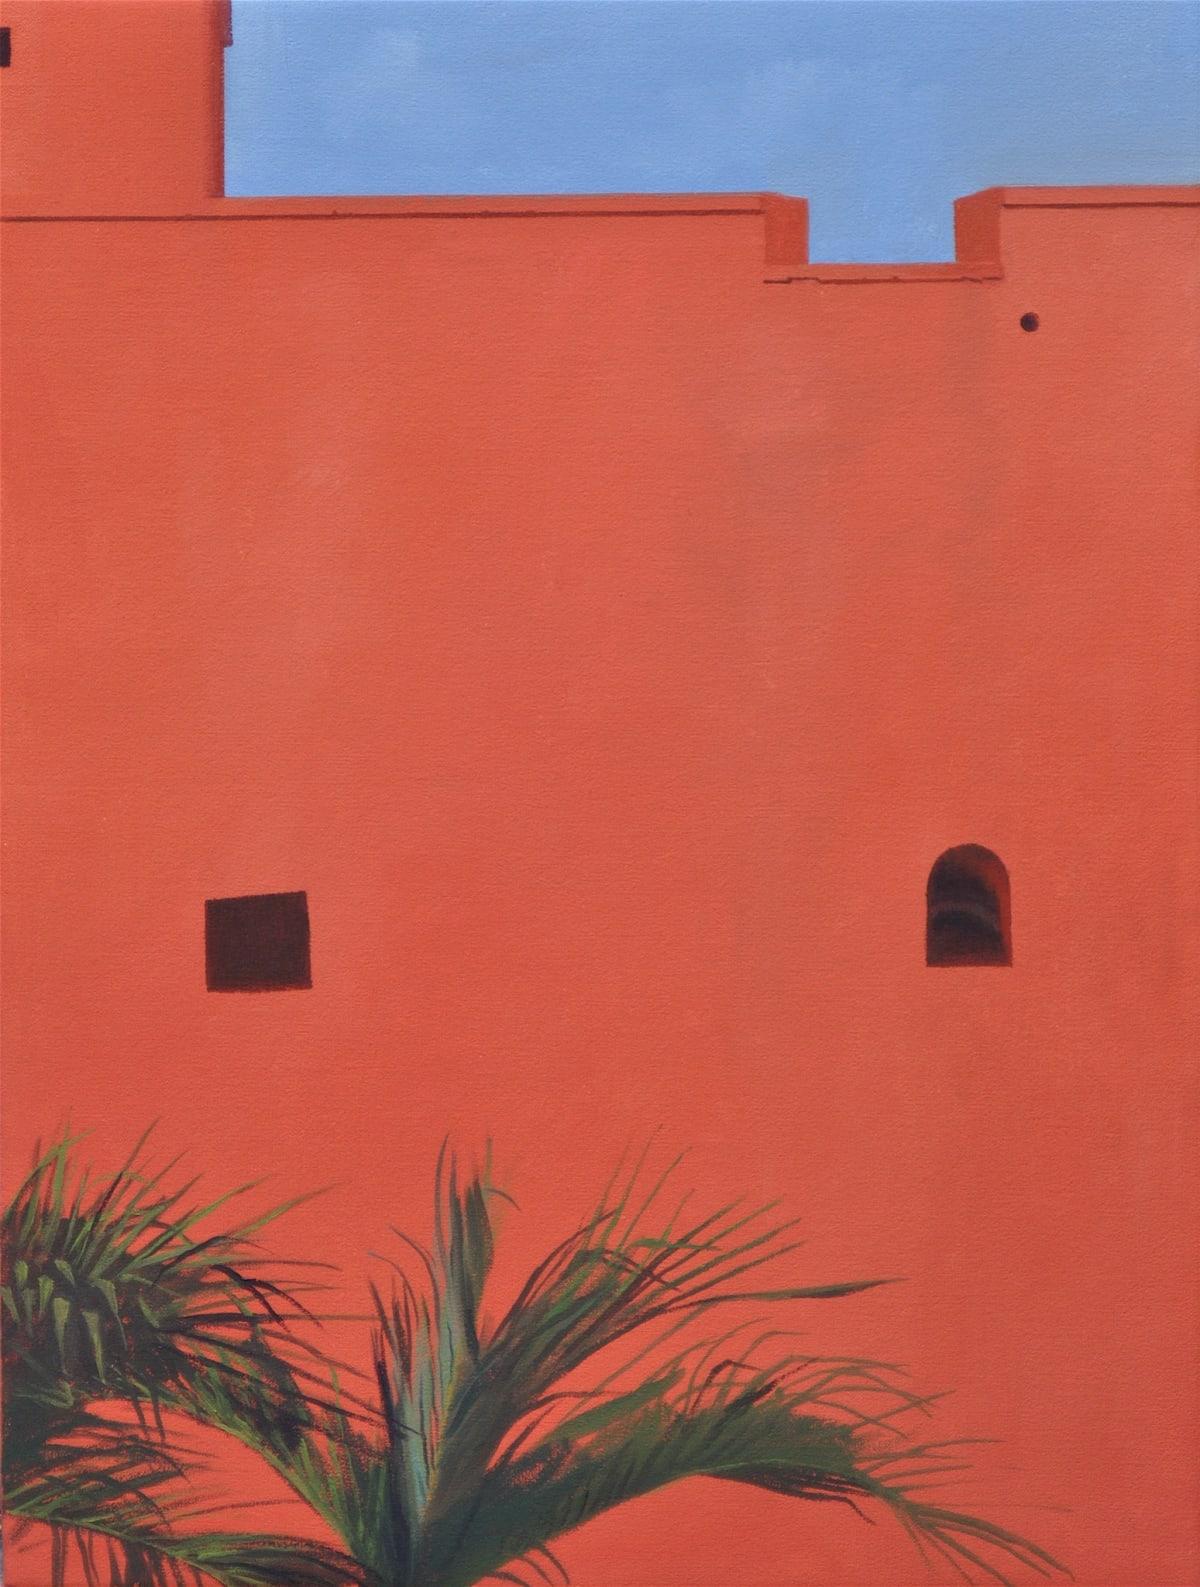 Carl Laubin Fort Christian 1, 2016 Oil on canvas 41 x 30 cm